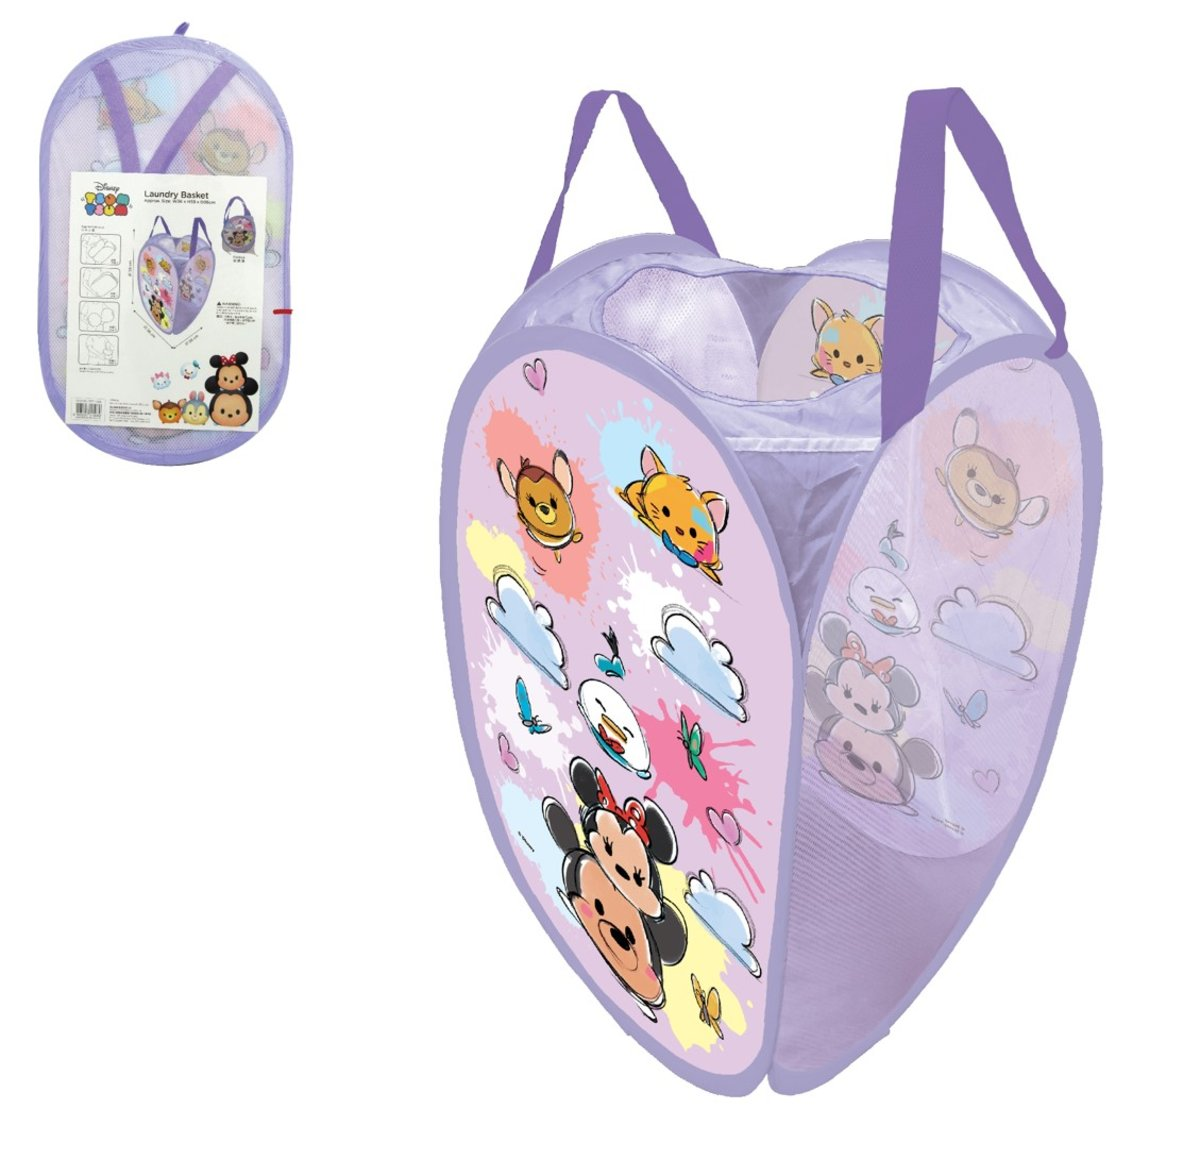 Disney迪士尼 --foldable laundry basket C (Licensed by Disney)